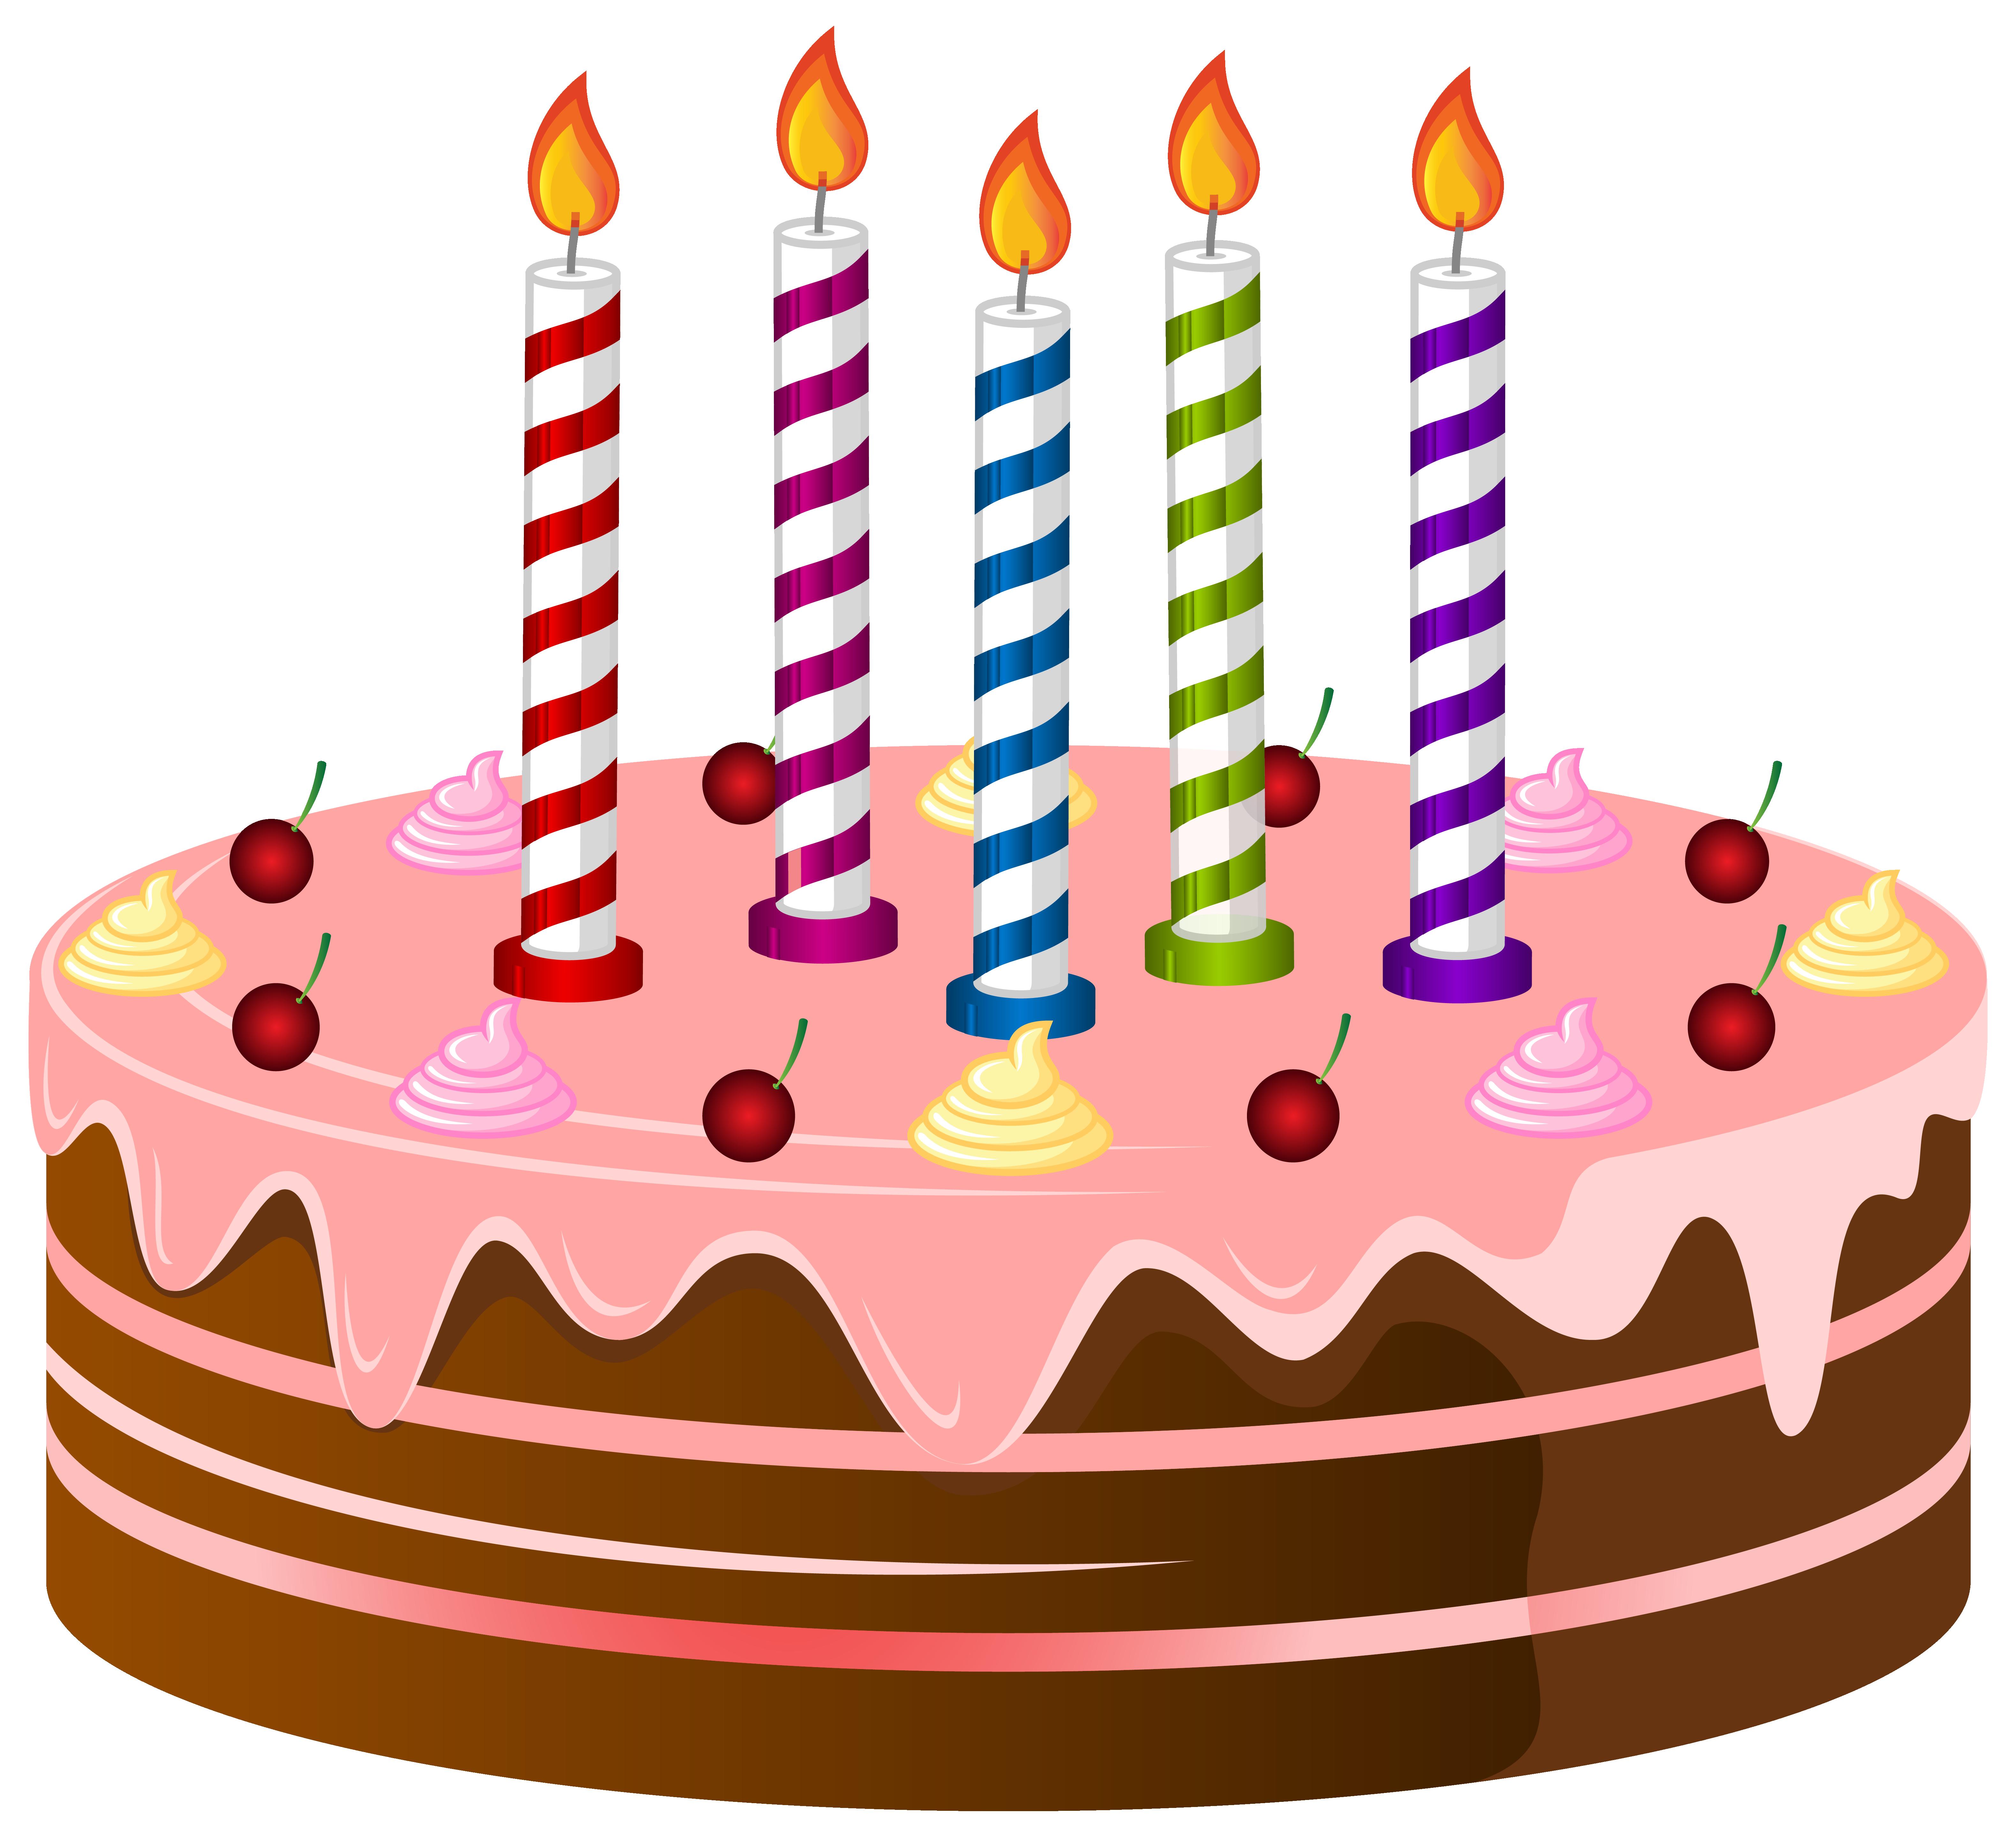 Free birthday cake clip art .-Free birthday cake clip art .-10